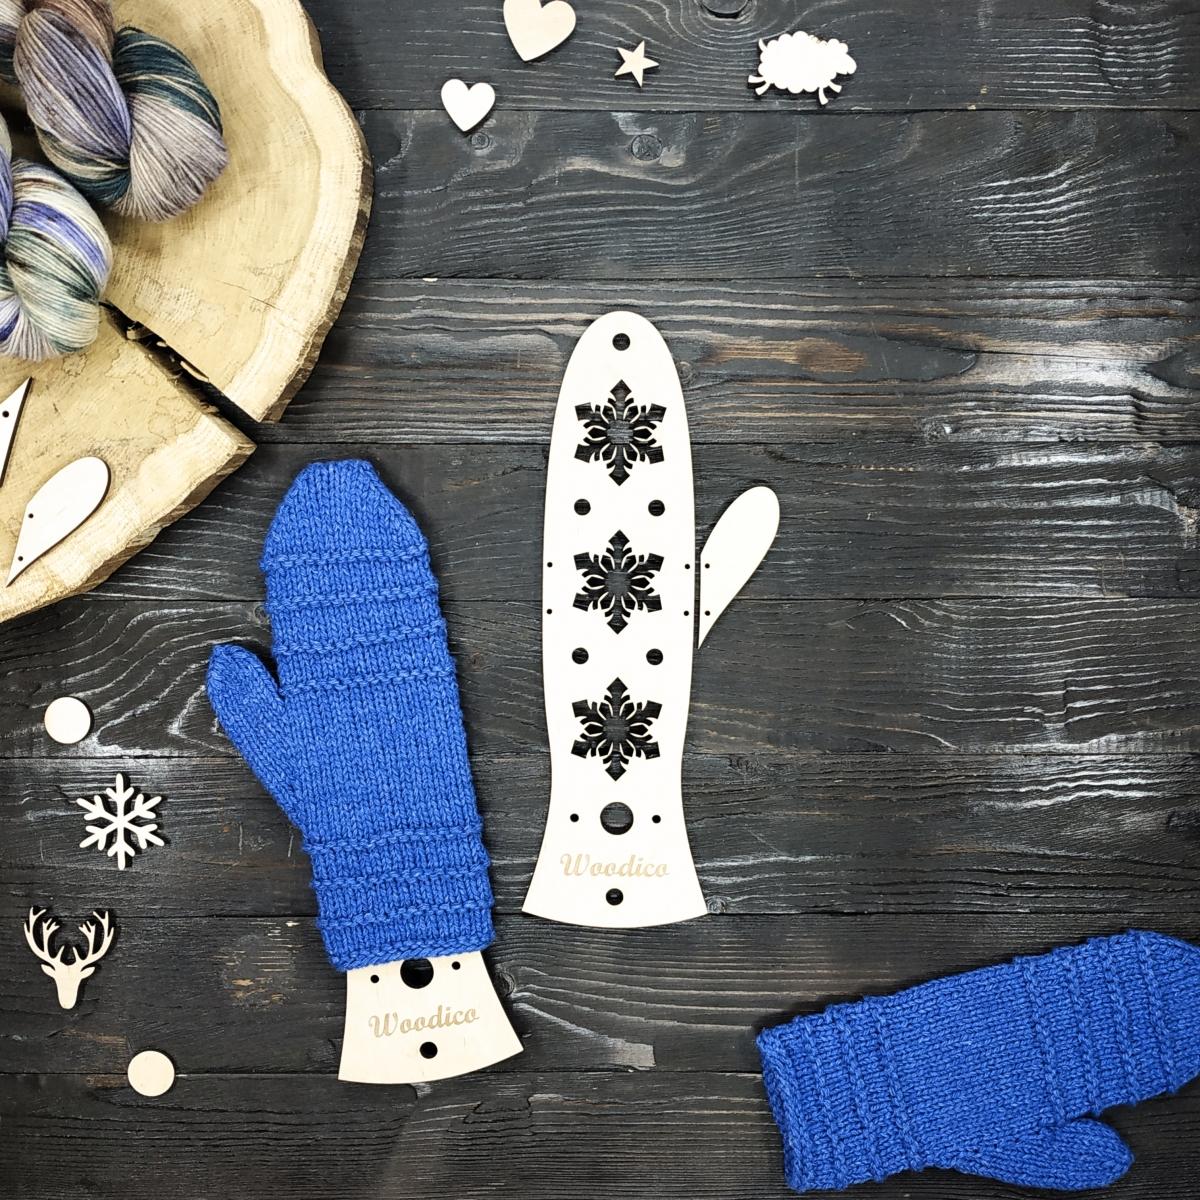 woodico.pro wooden mitten blockers ice 1200x1200 - Wooden mitten blockers / Ice